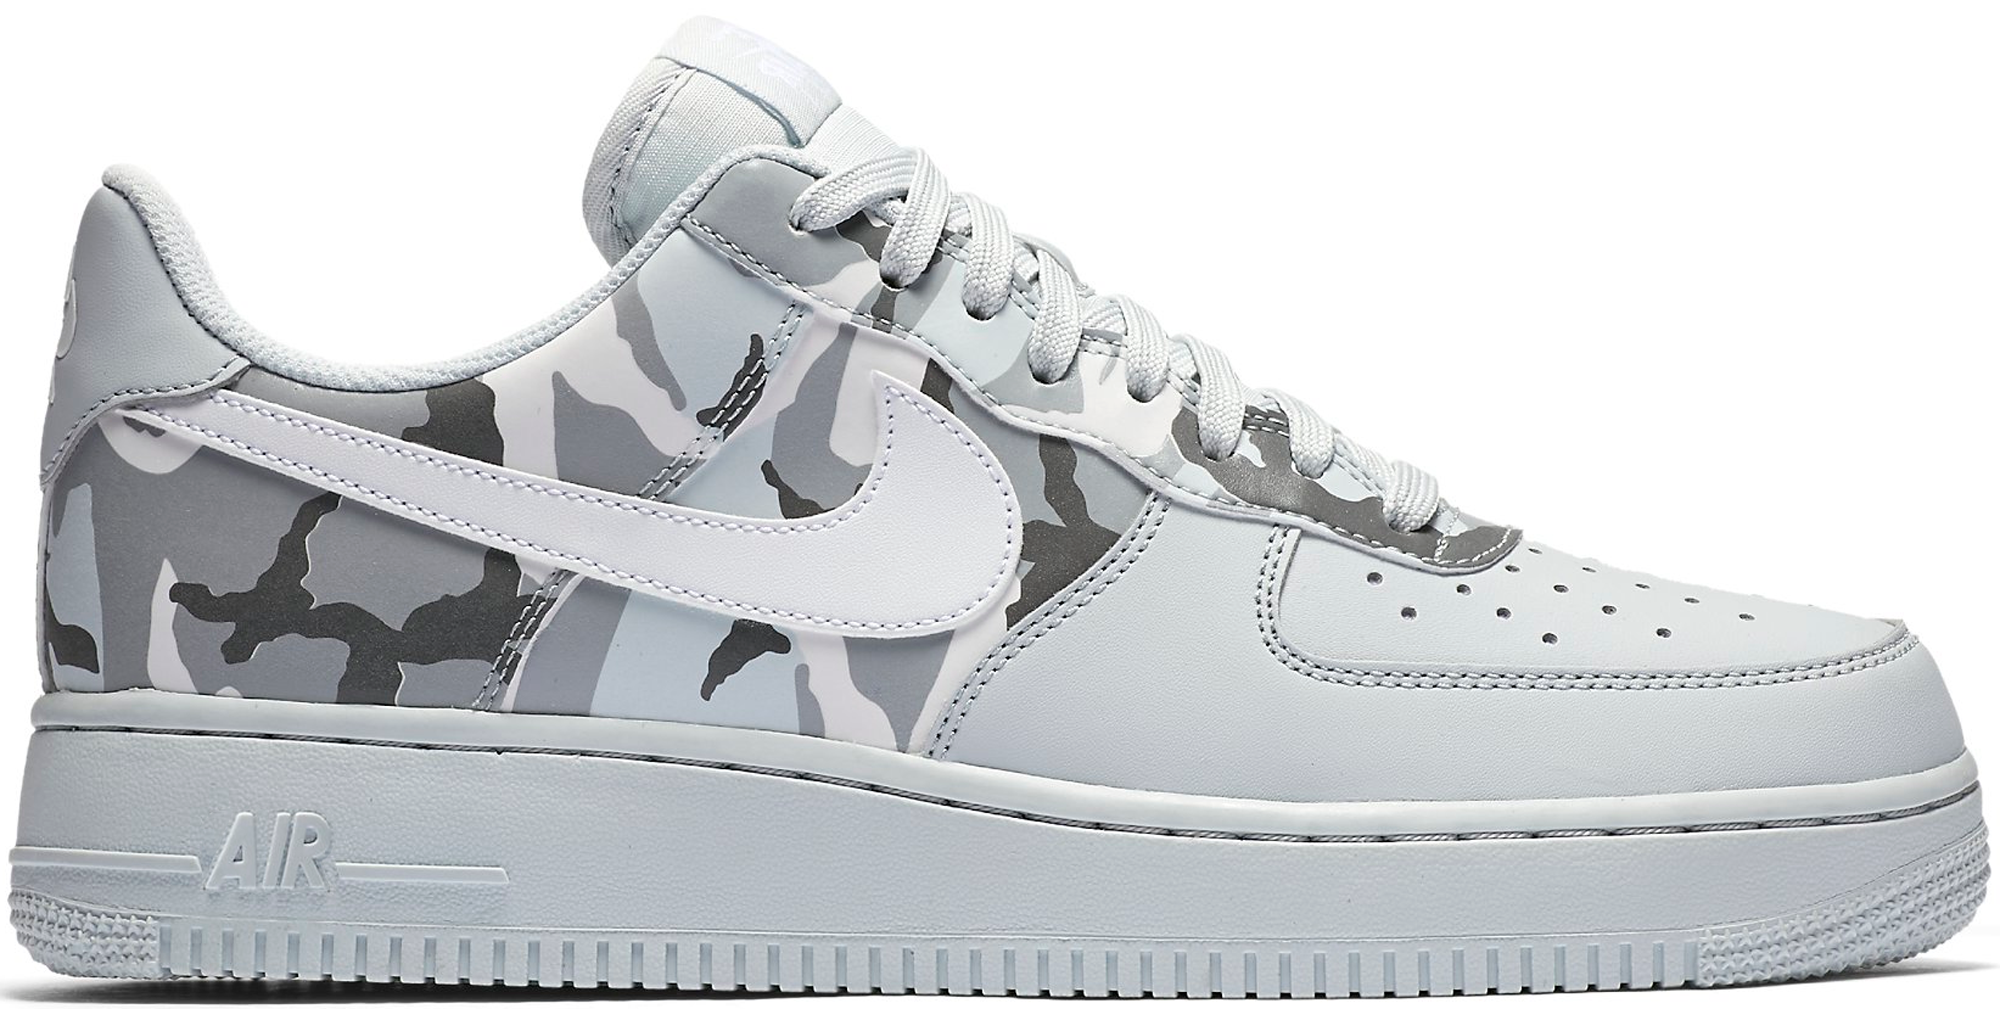 Nike Air Force 1 Winter Camo - StockX News